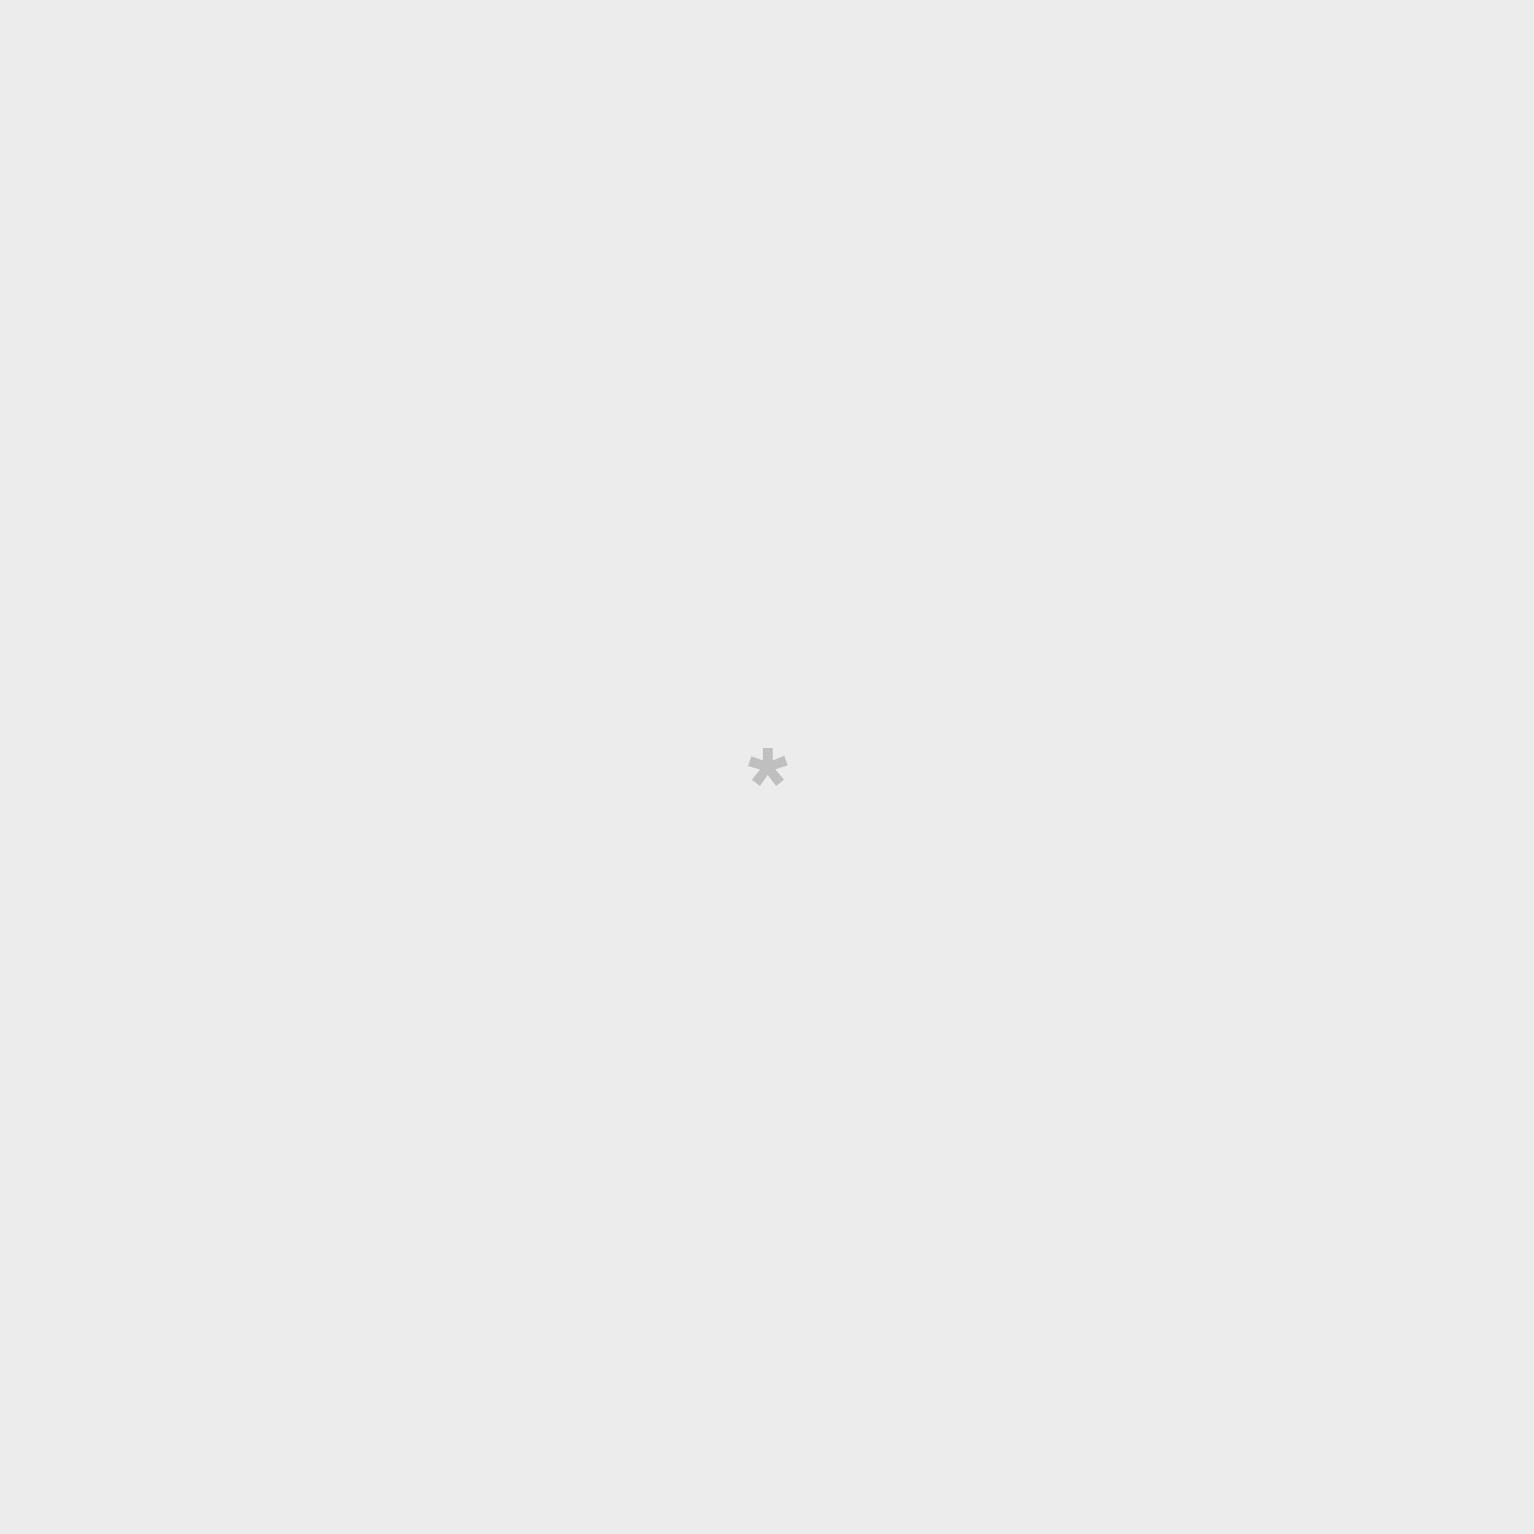 Transparent iPhone SE case - Avocados